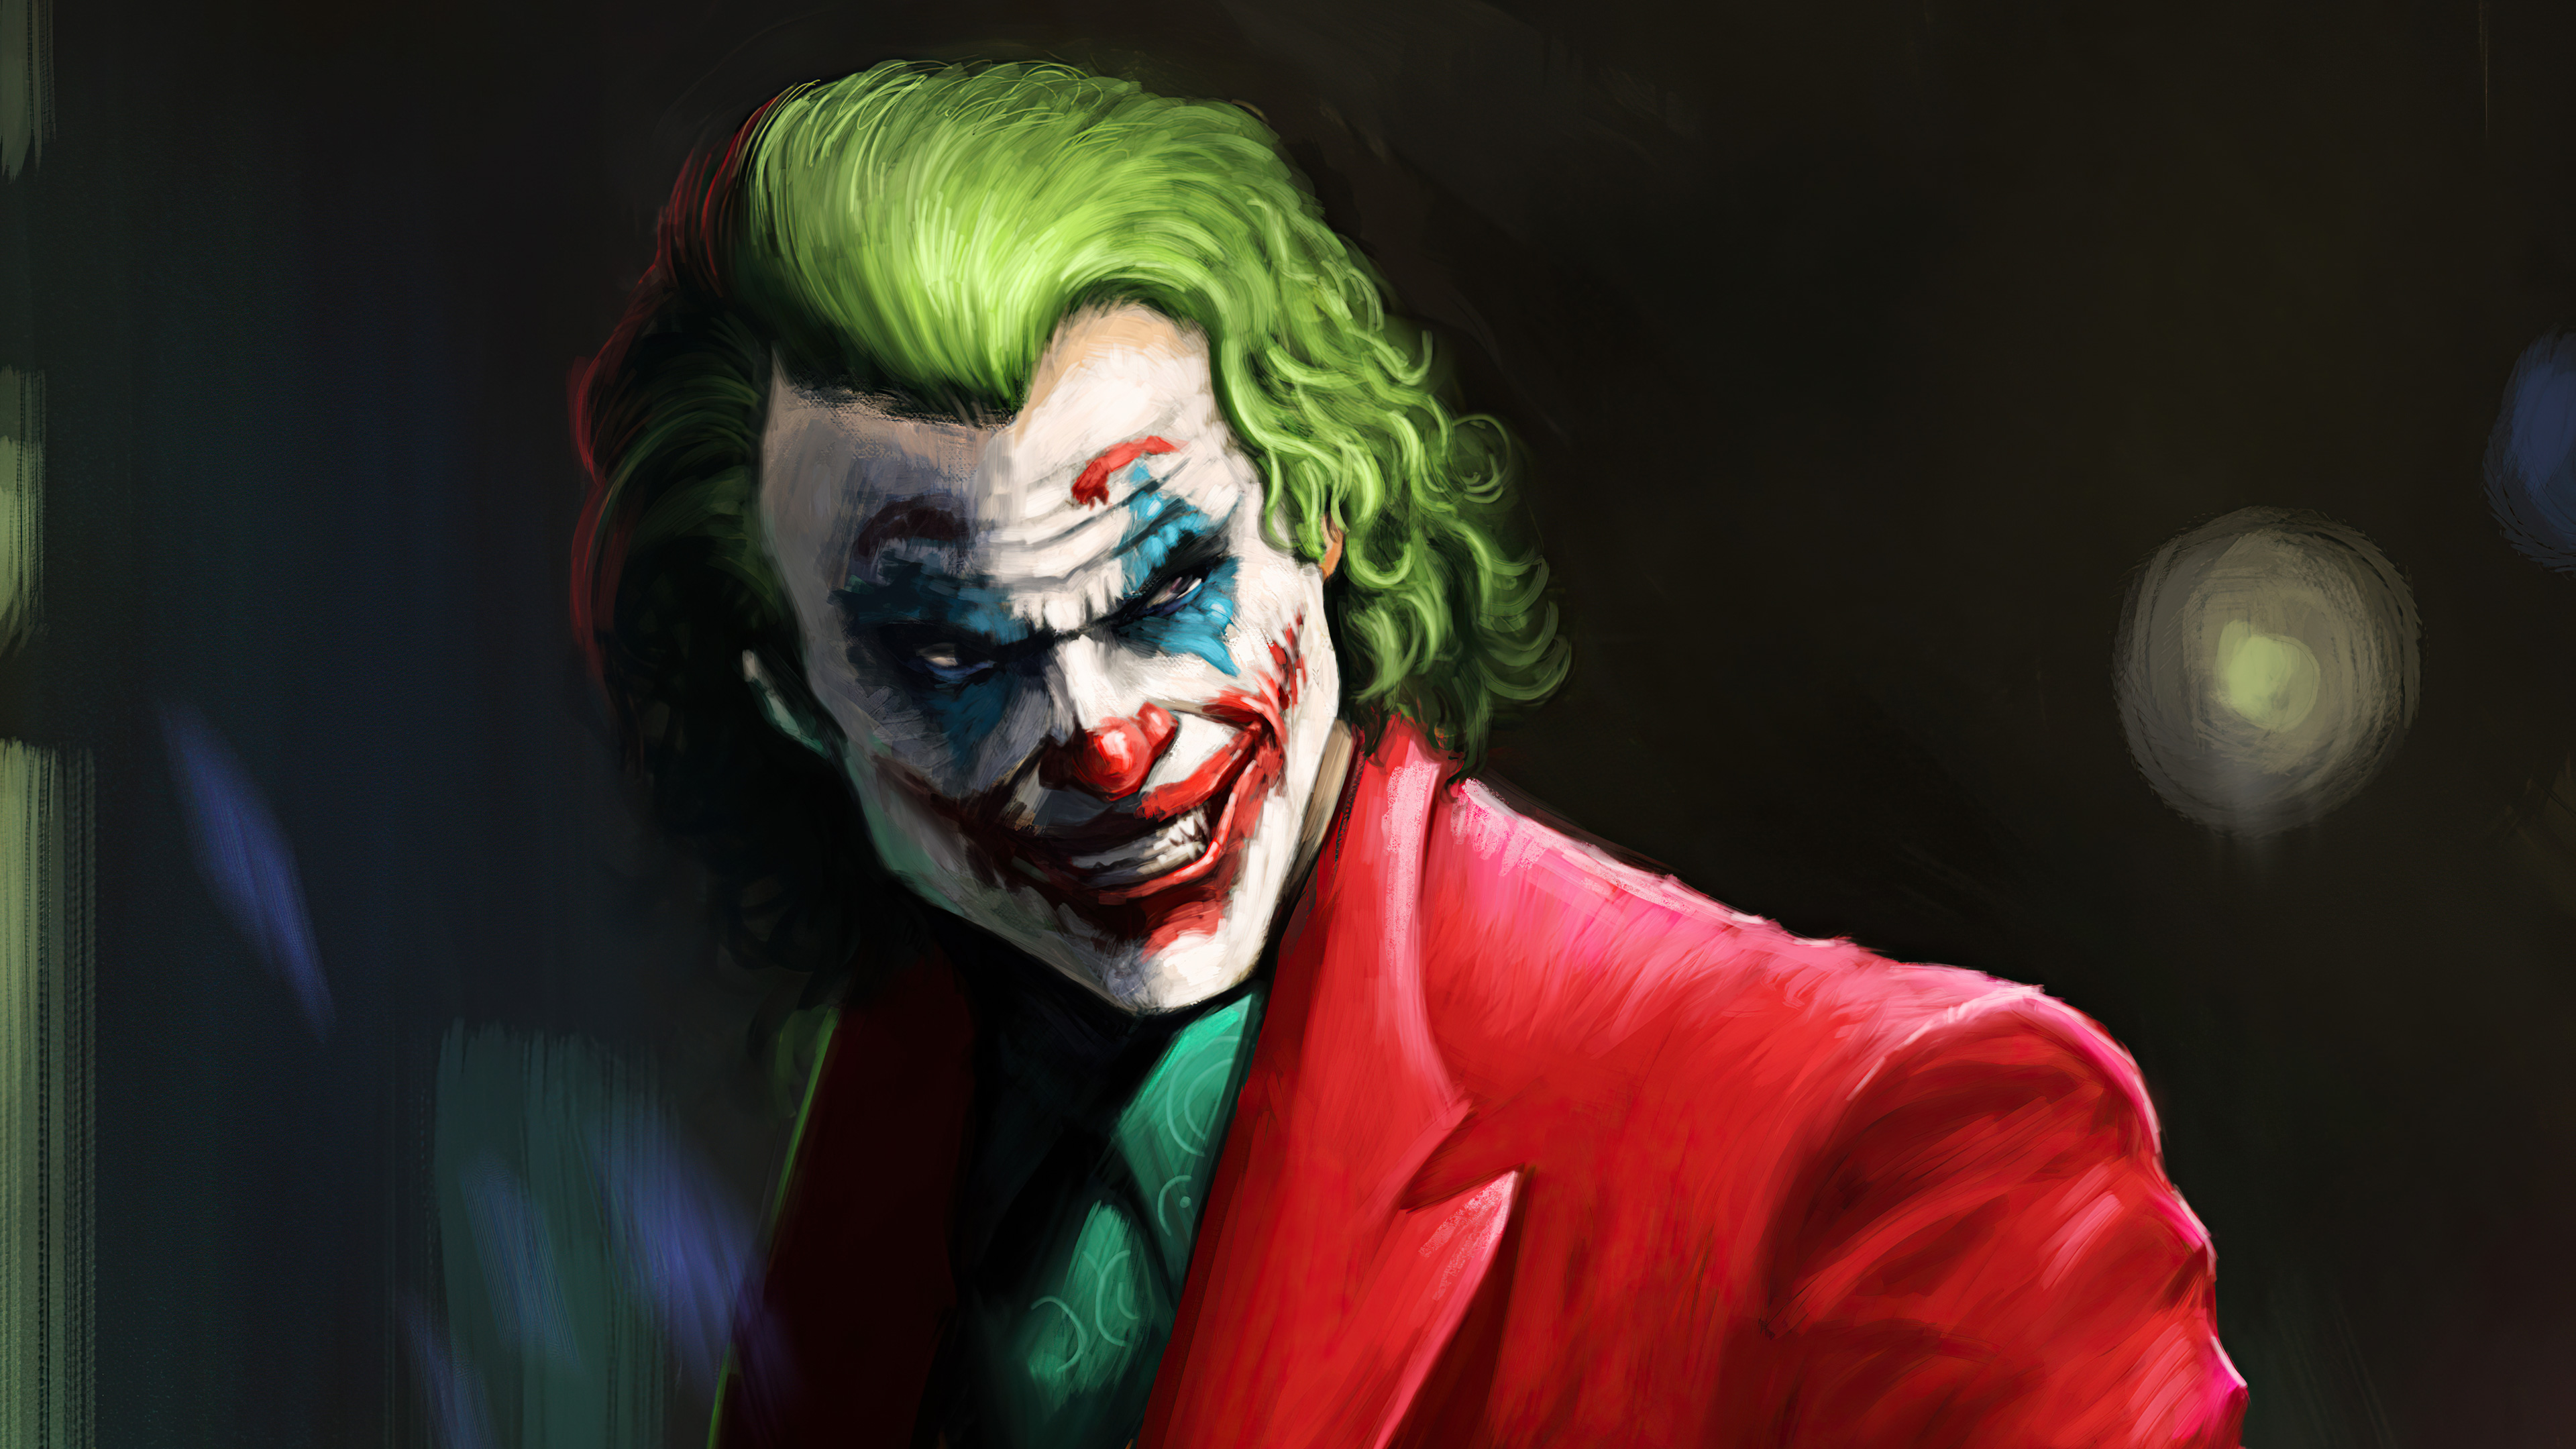 Wallpaper Joker Fanart 2021